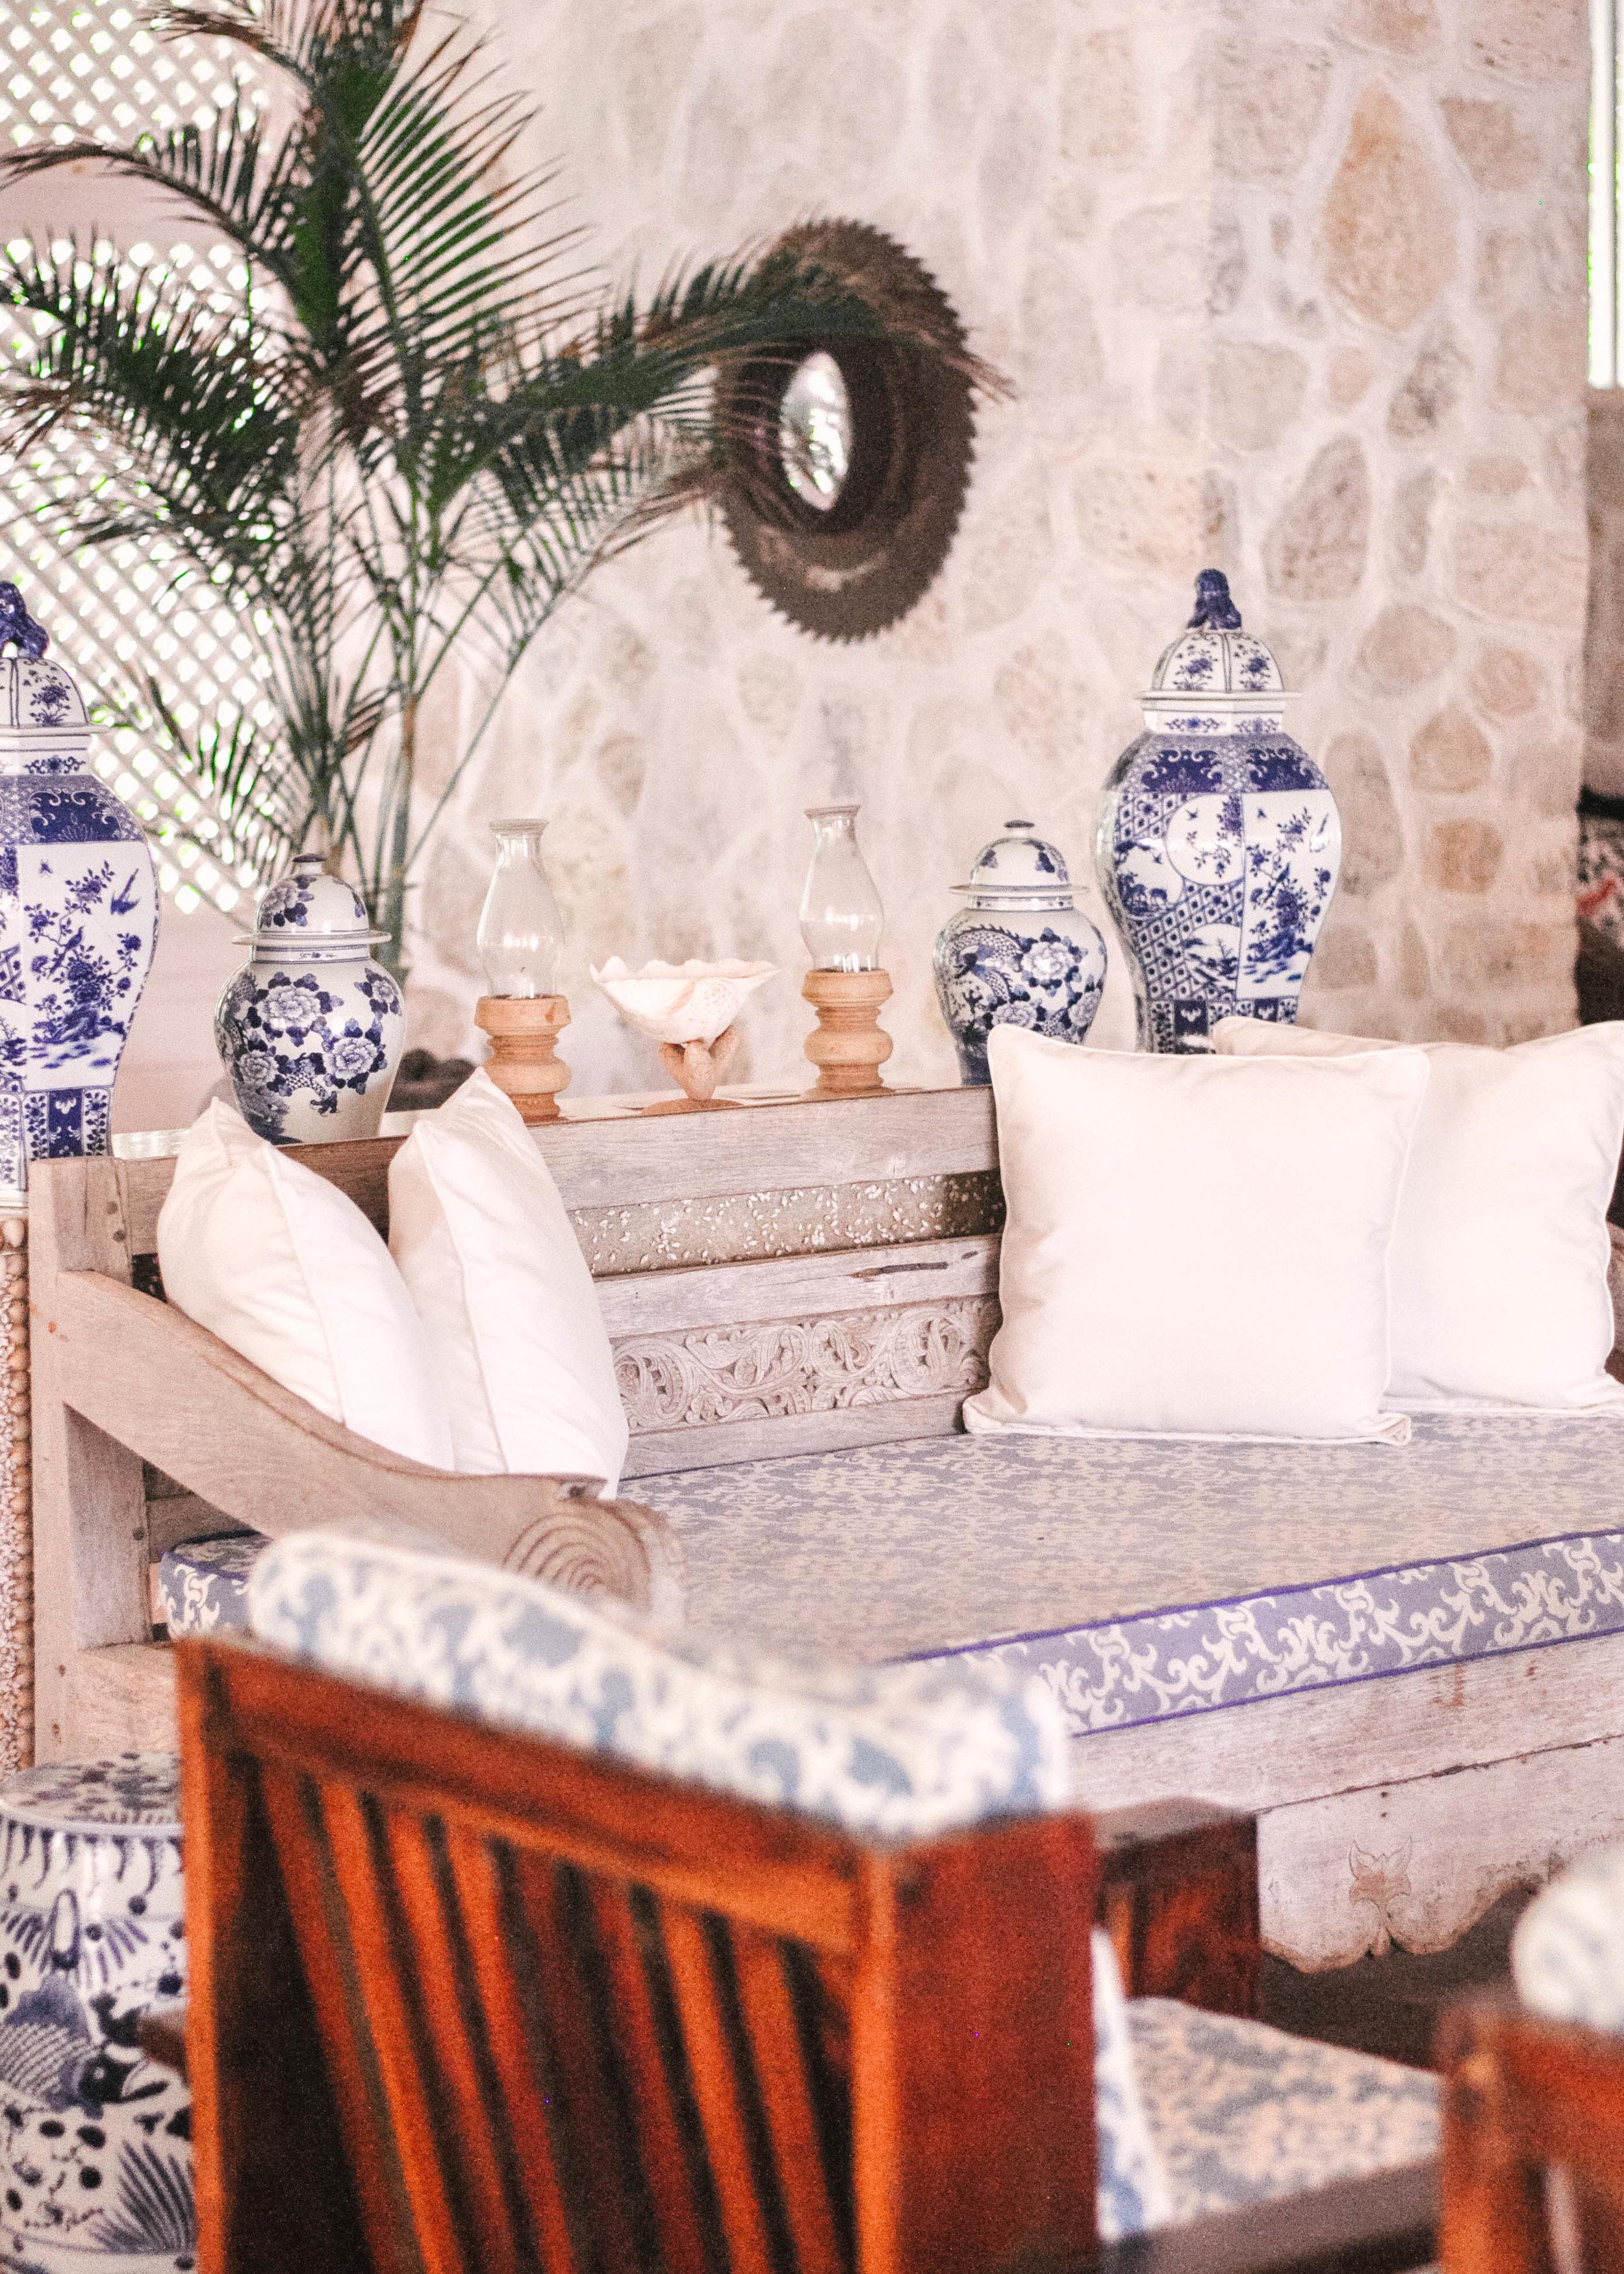 Blue and white Caribbean decor